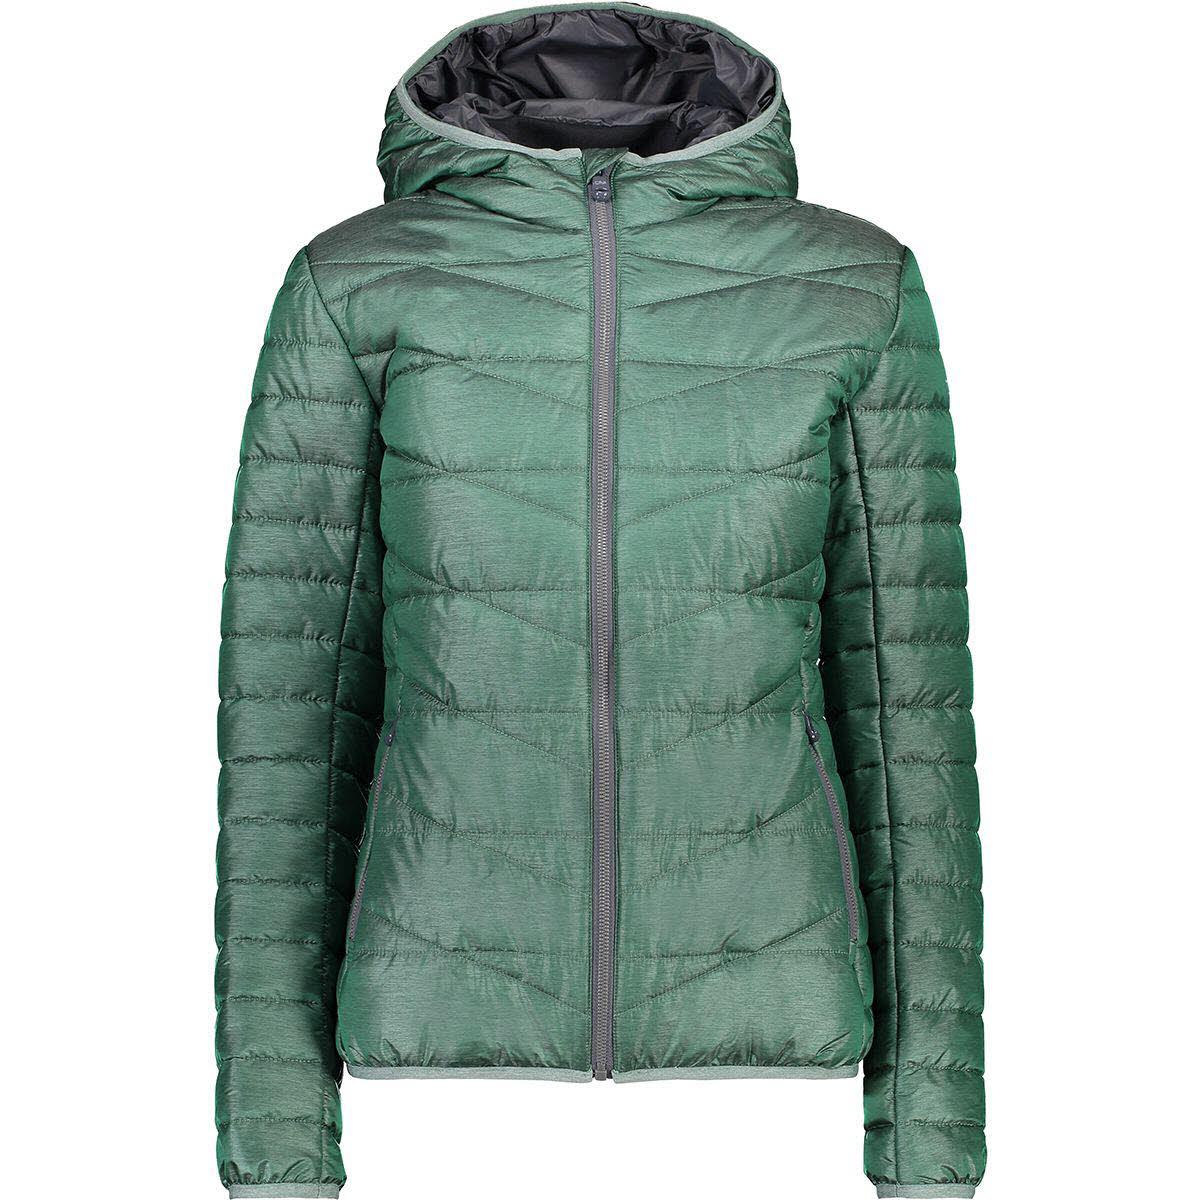 Jacken | Bekleidung | Sportmarken24